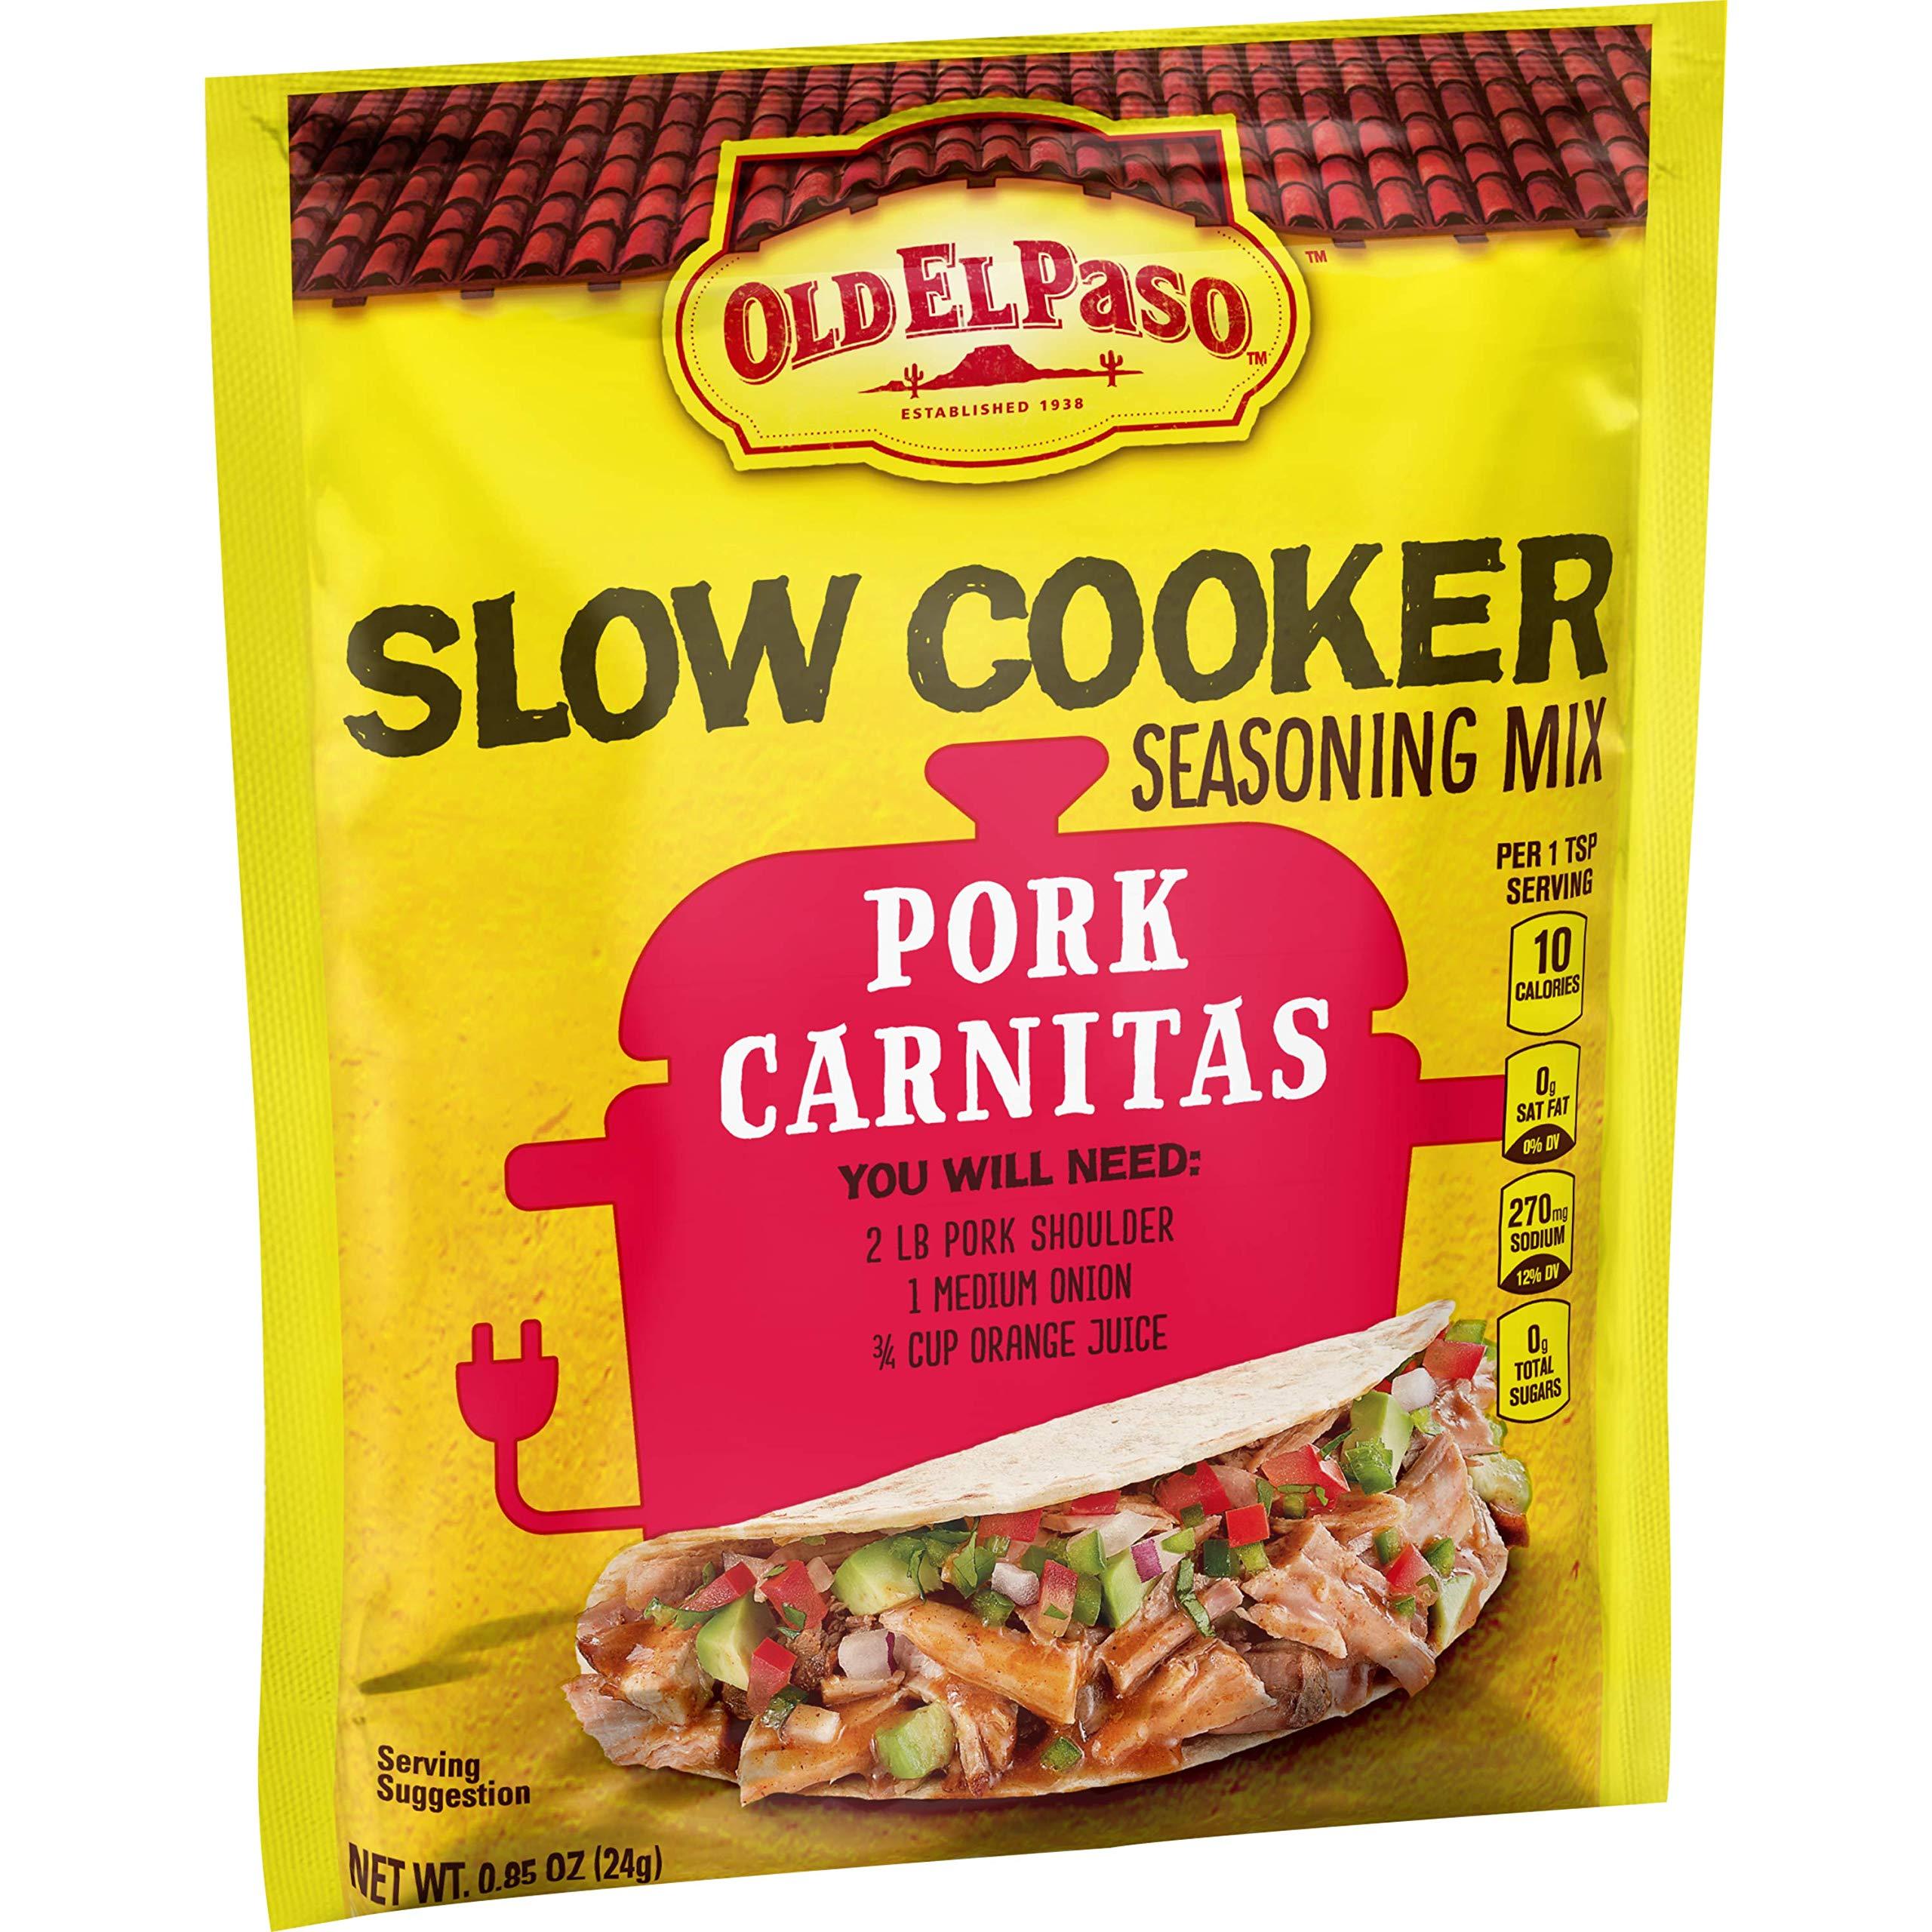 Old El Paso Slow Cooker Seasoning Mix Pork Carnitas, 0.85 oz (Pack of 32) by Old El Paso